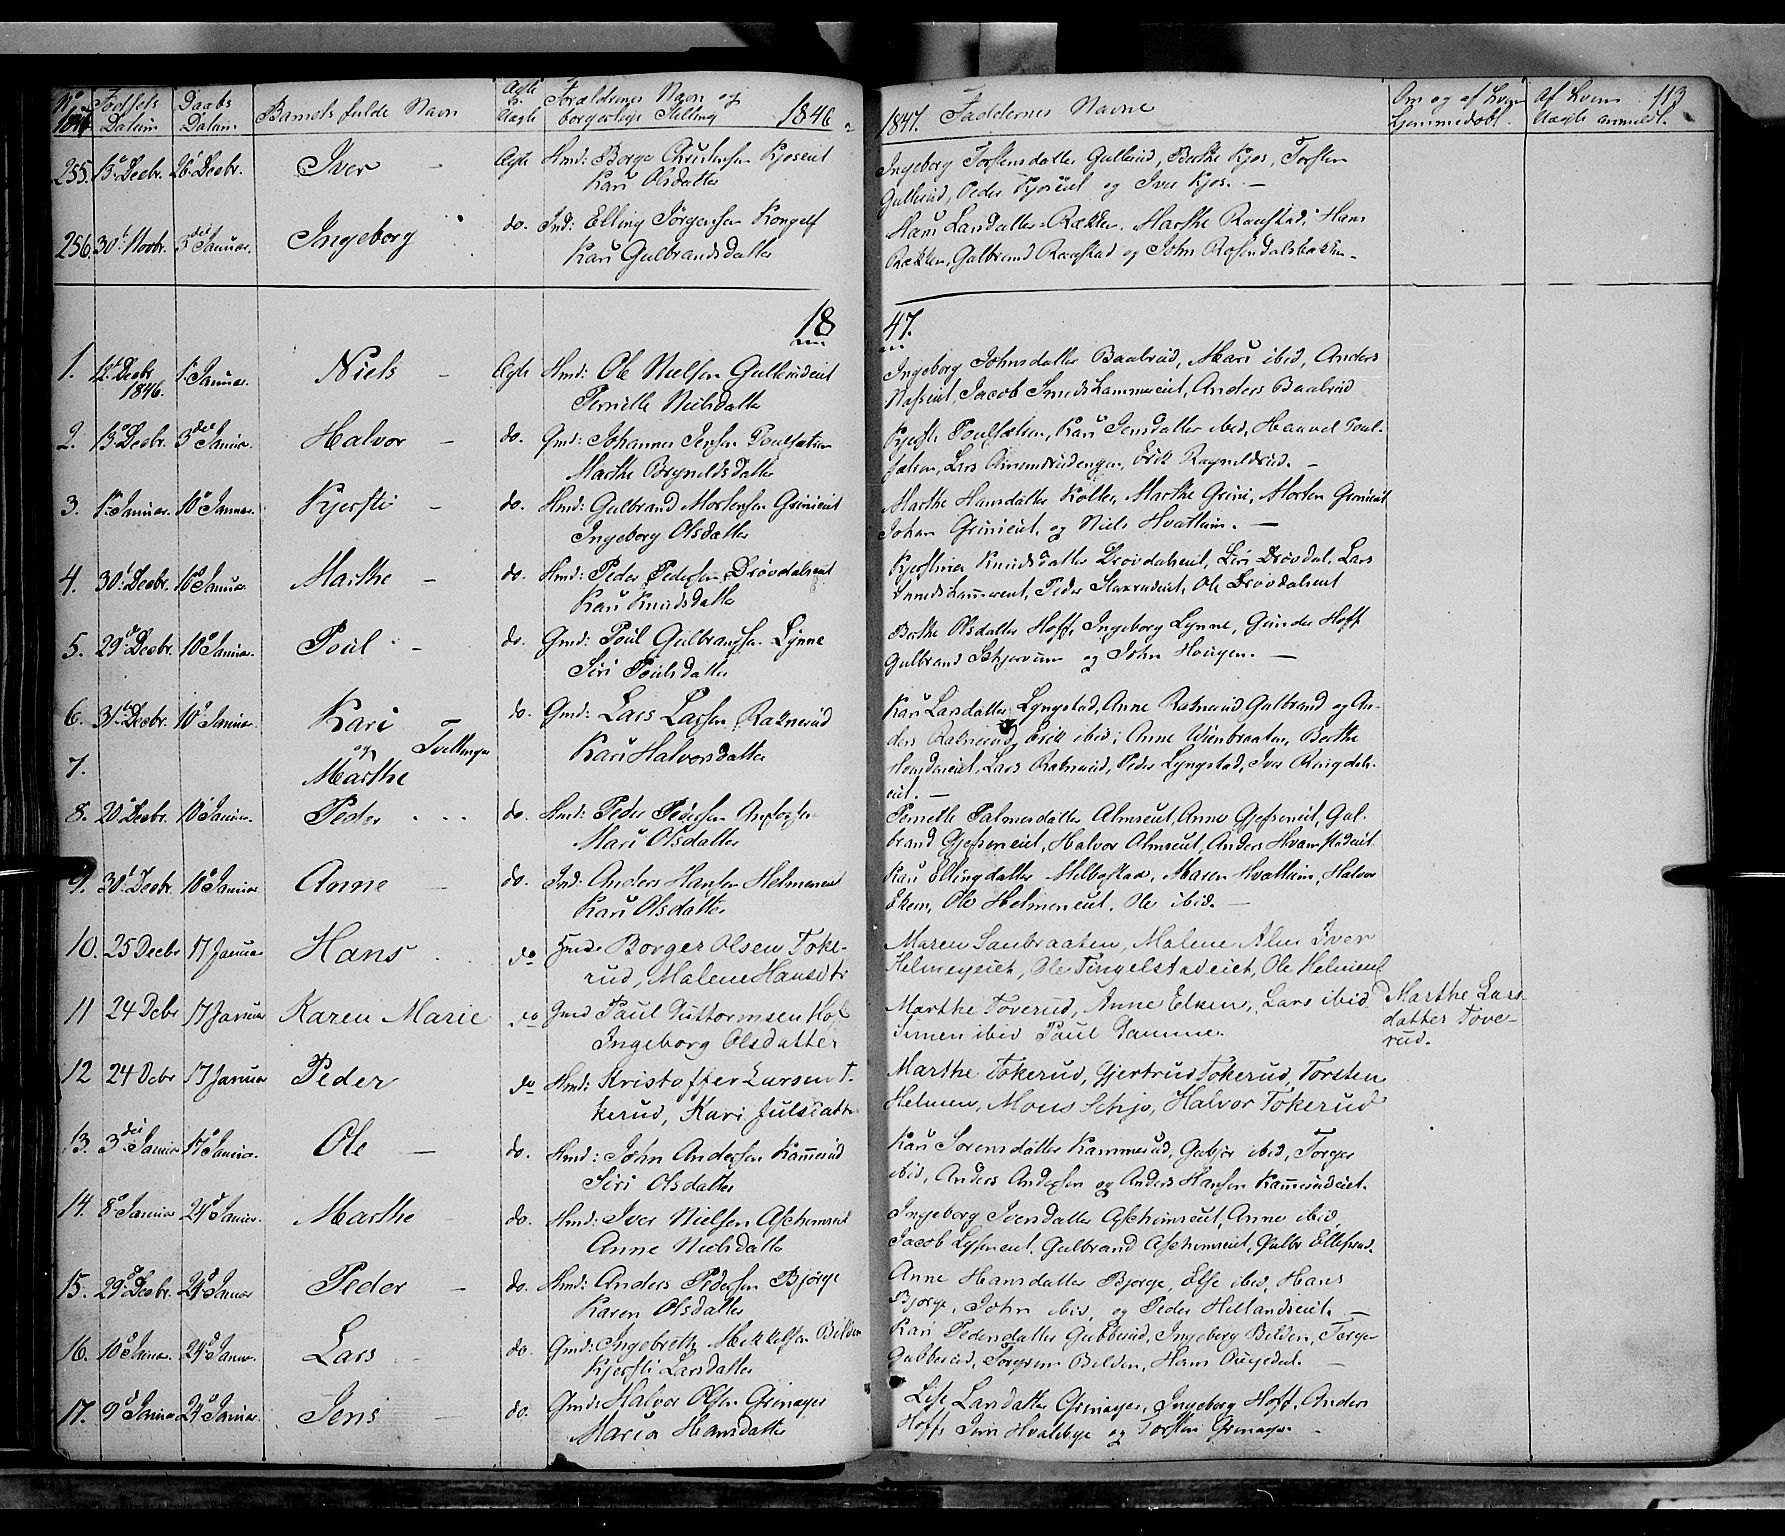 SAH, Gran prestekontor, Ministerialbok nr. 11, 1842-1856, s. 112-113